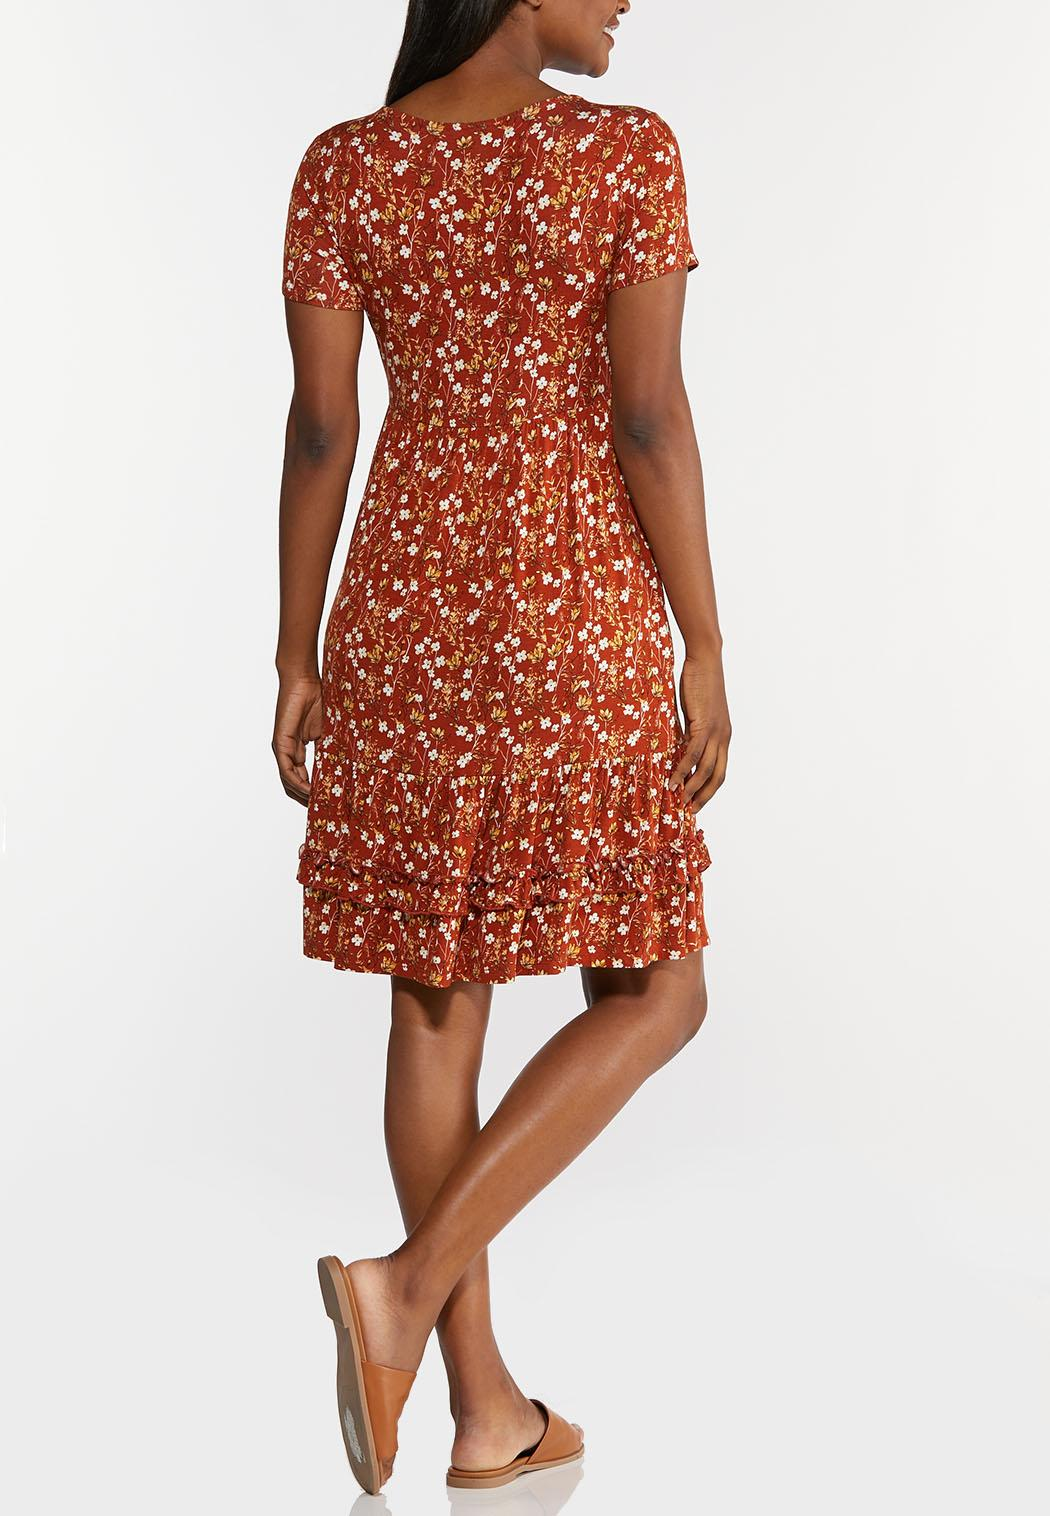 Plus Size Rust Floral Babydoll Dress (Item #44279689)